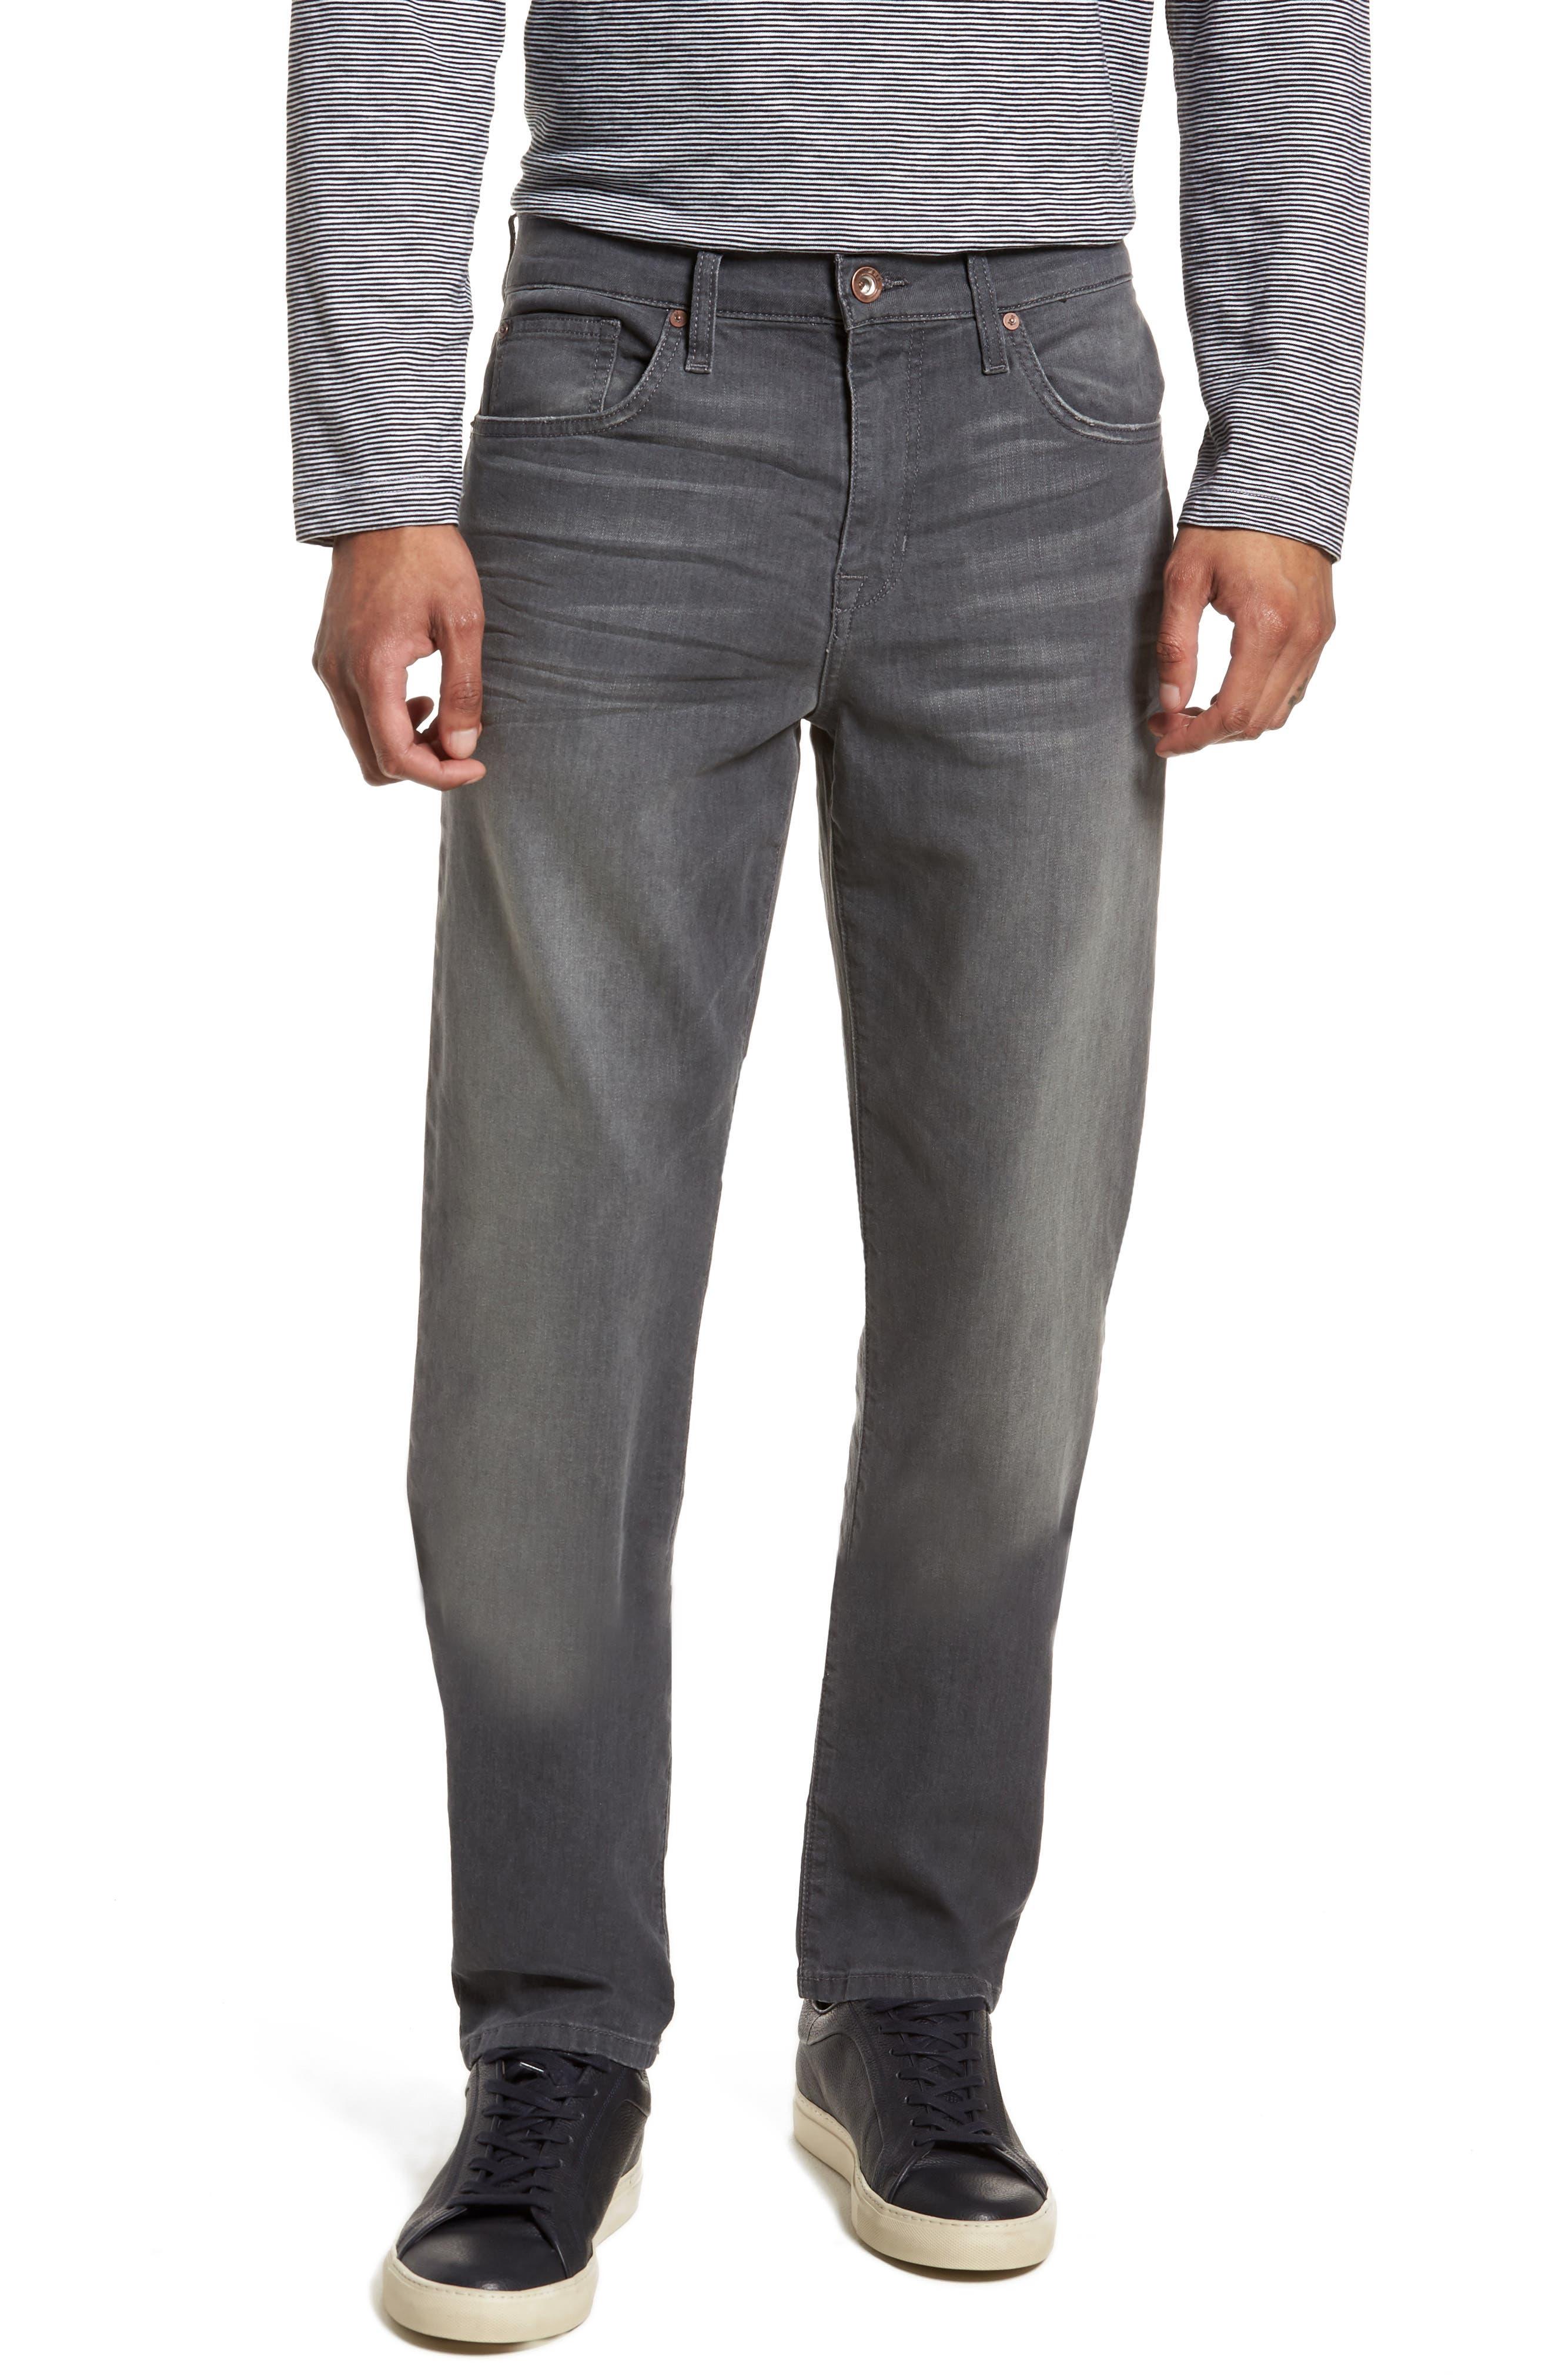 Folsom Athletic Slim Fit Jeans,                         Main,                         color, Julian